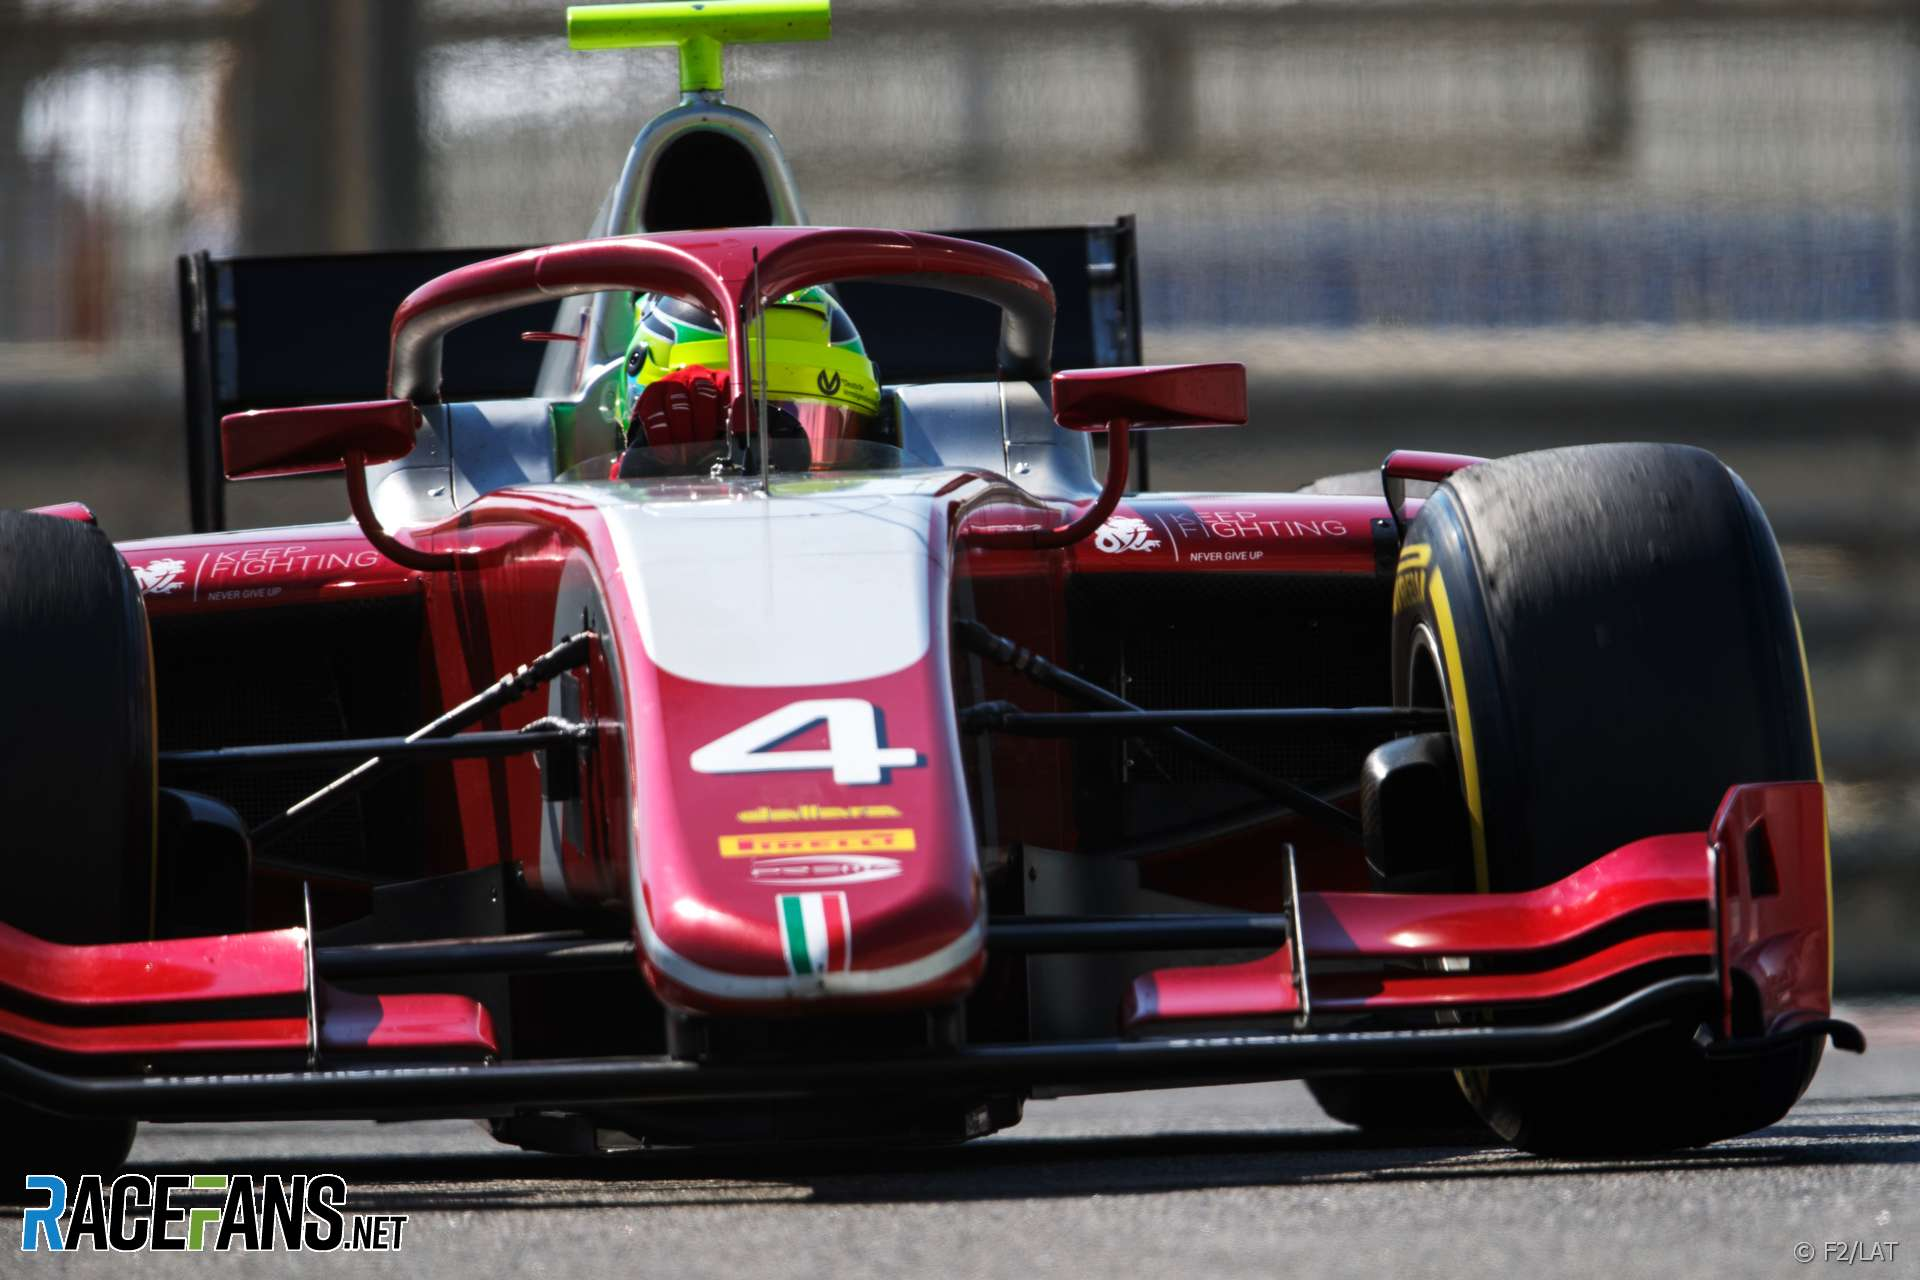 Mick Schumacher, Prema, Formula Two, Yas Marina, 2018